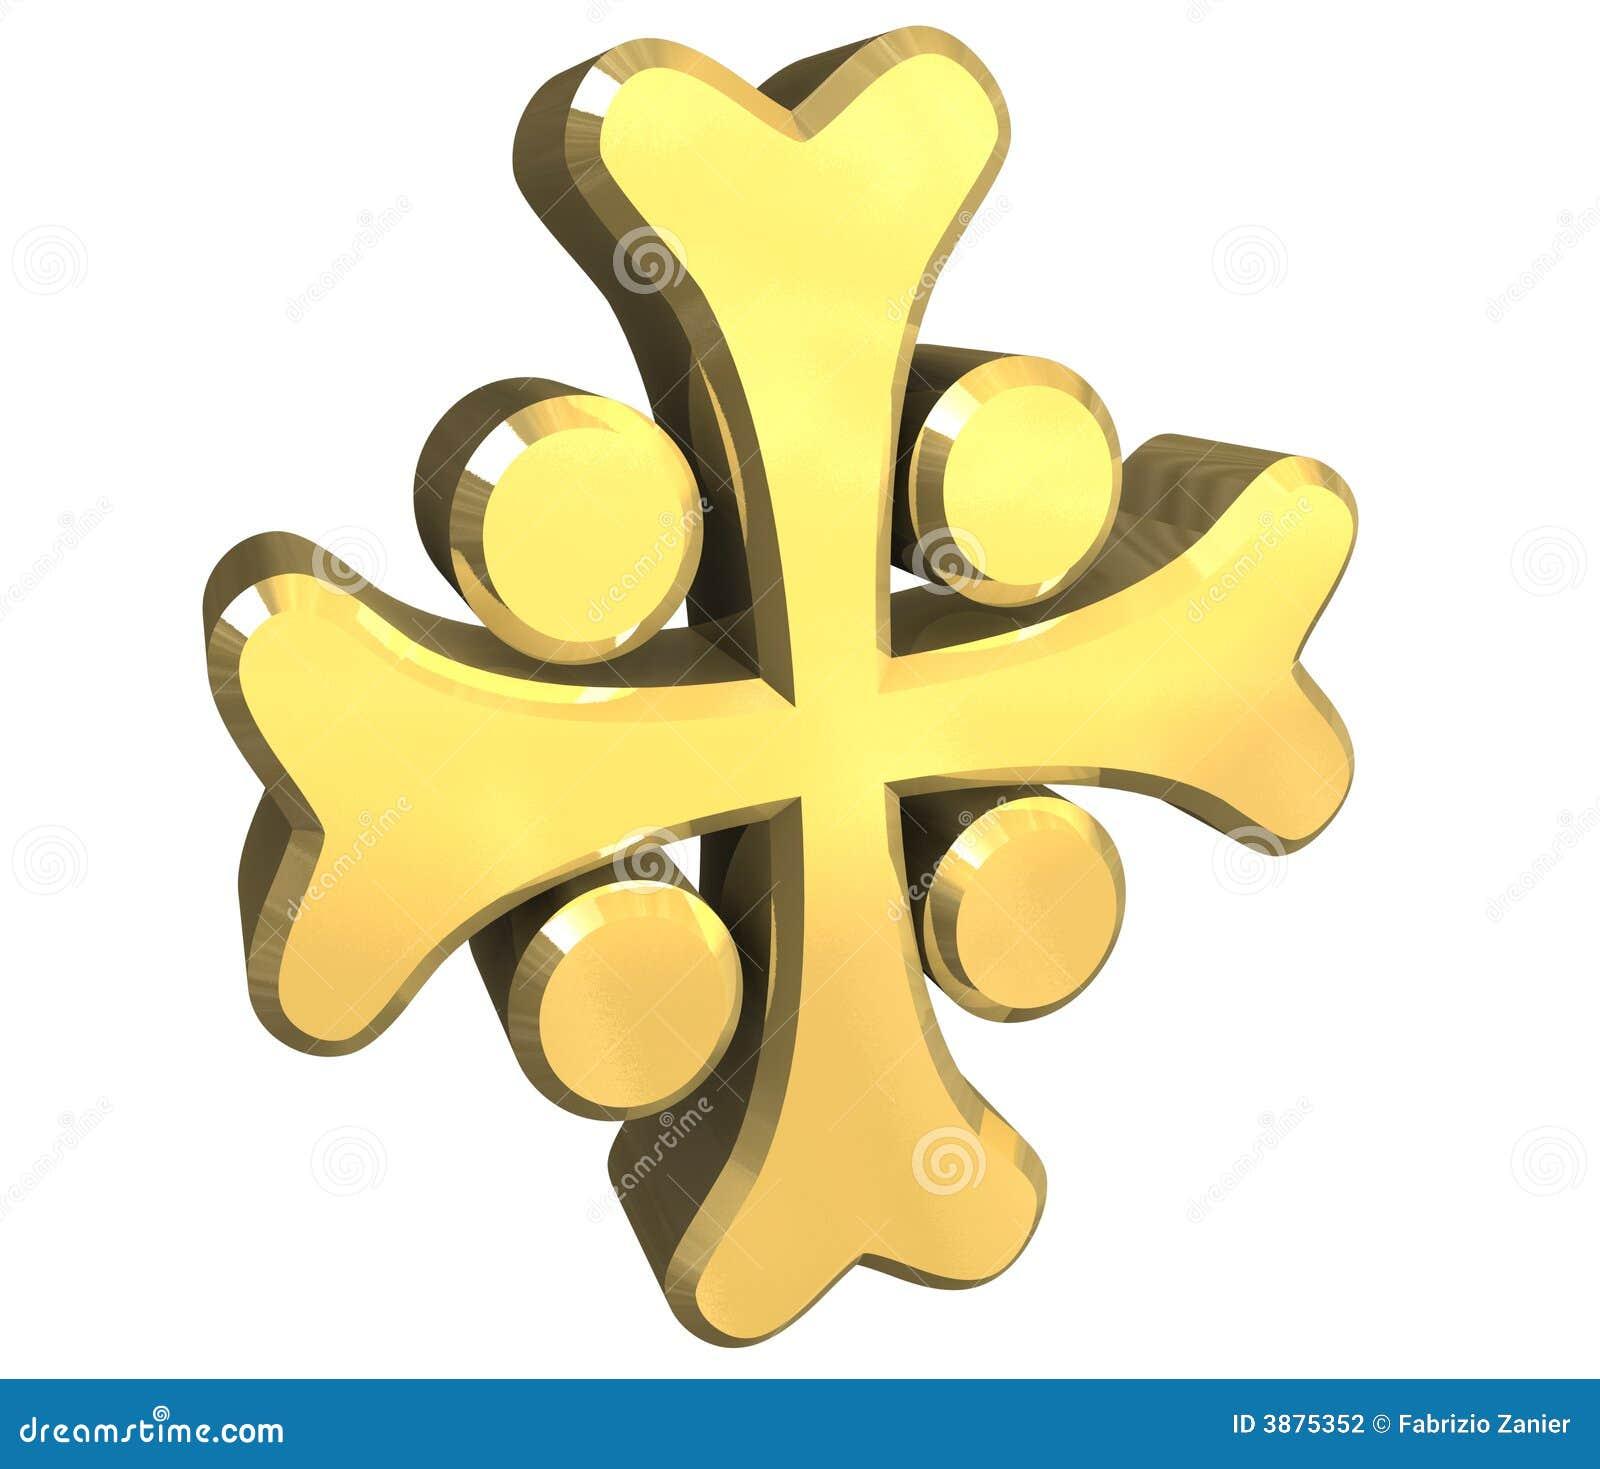 Traversa arminiana in oro - 3D